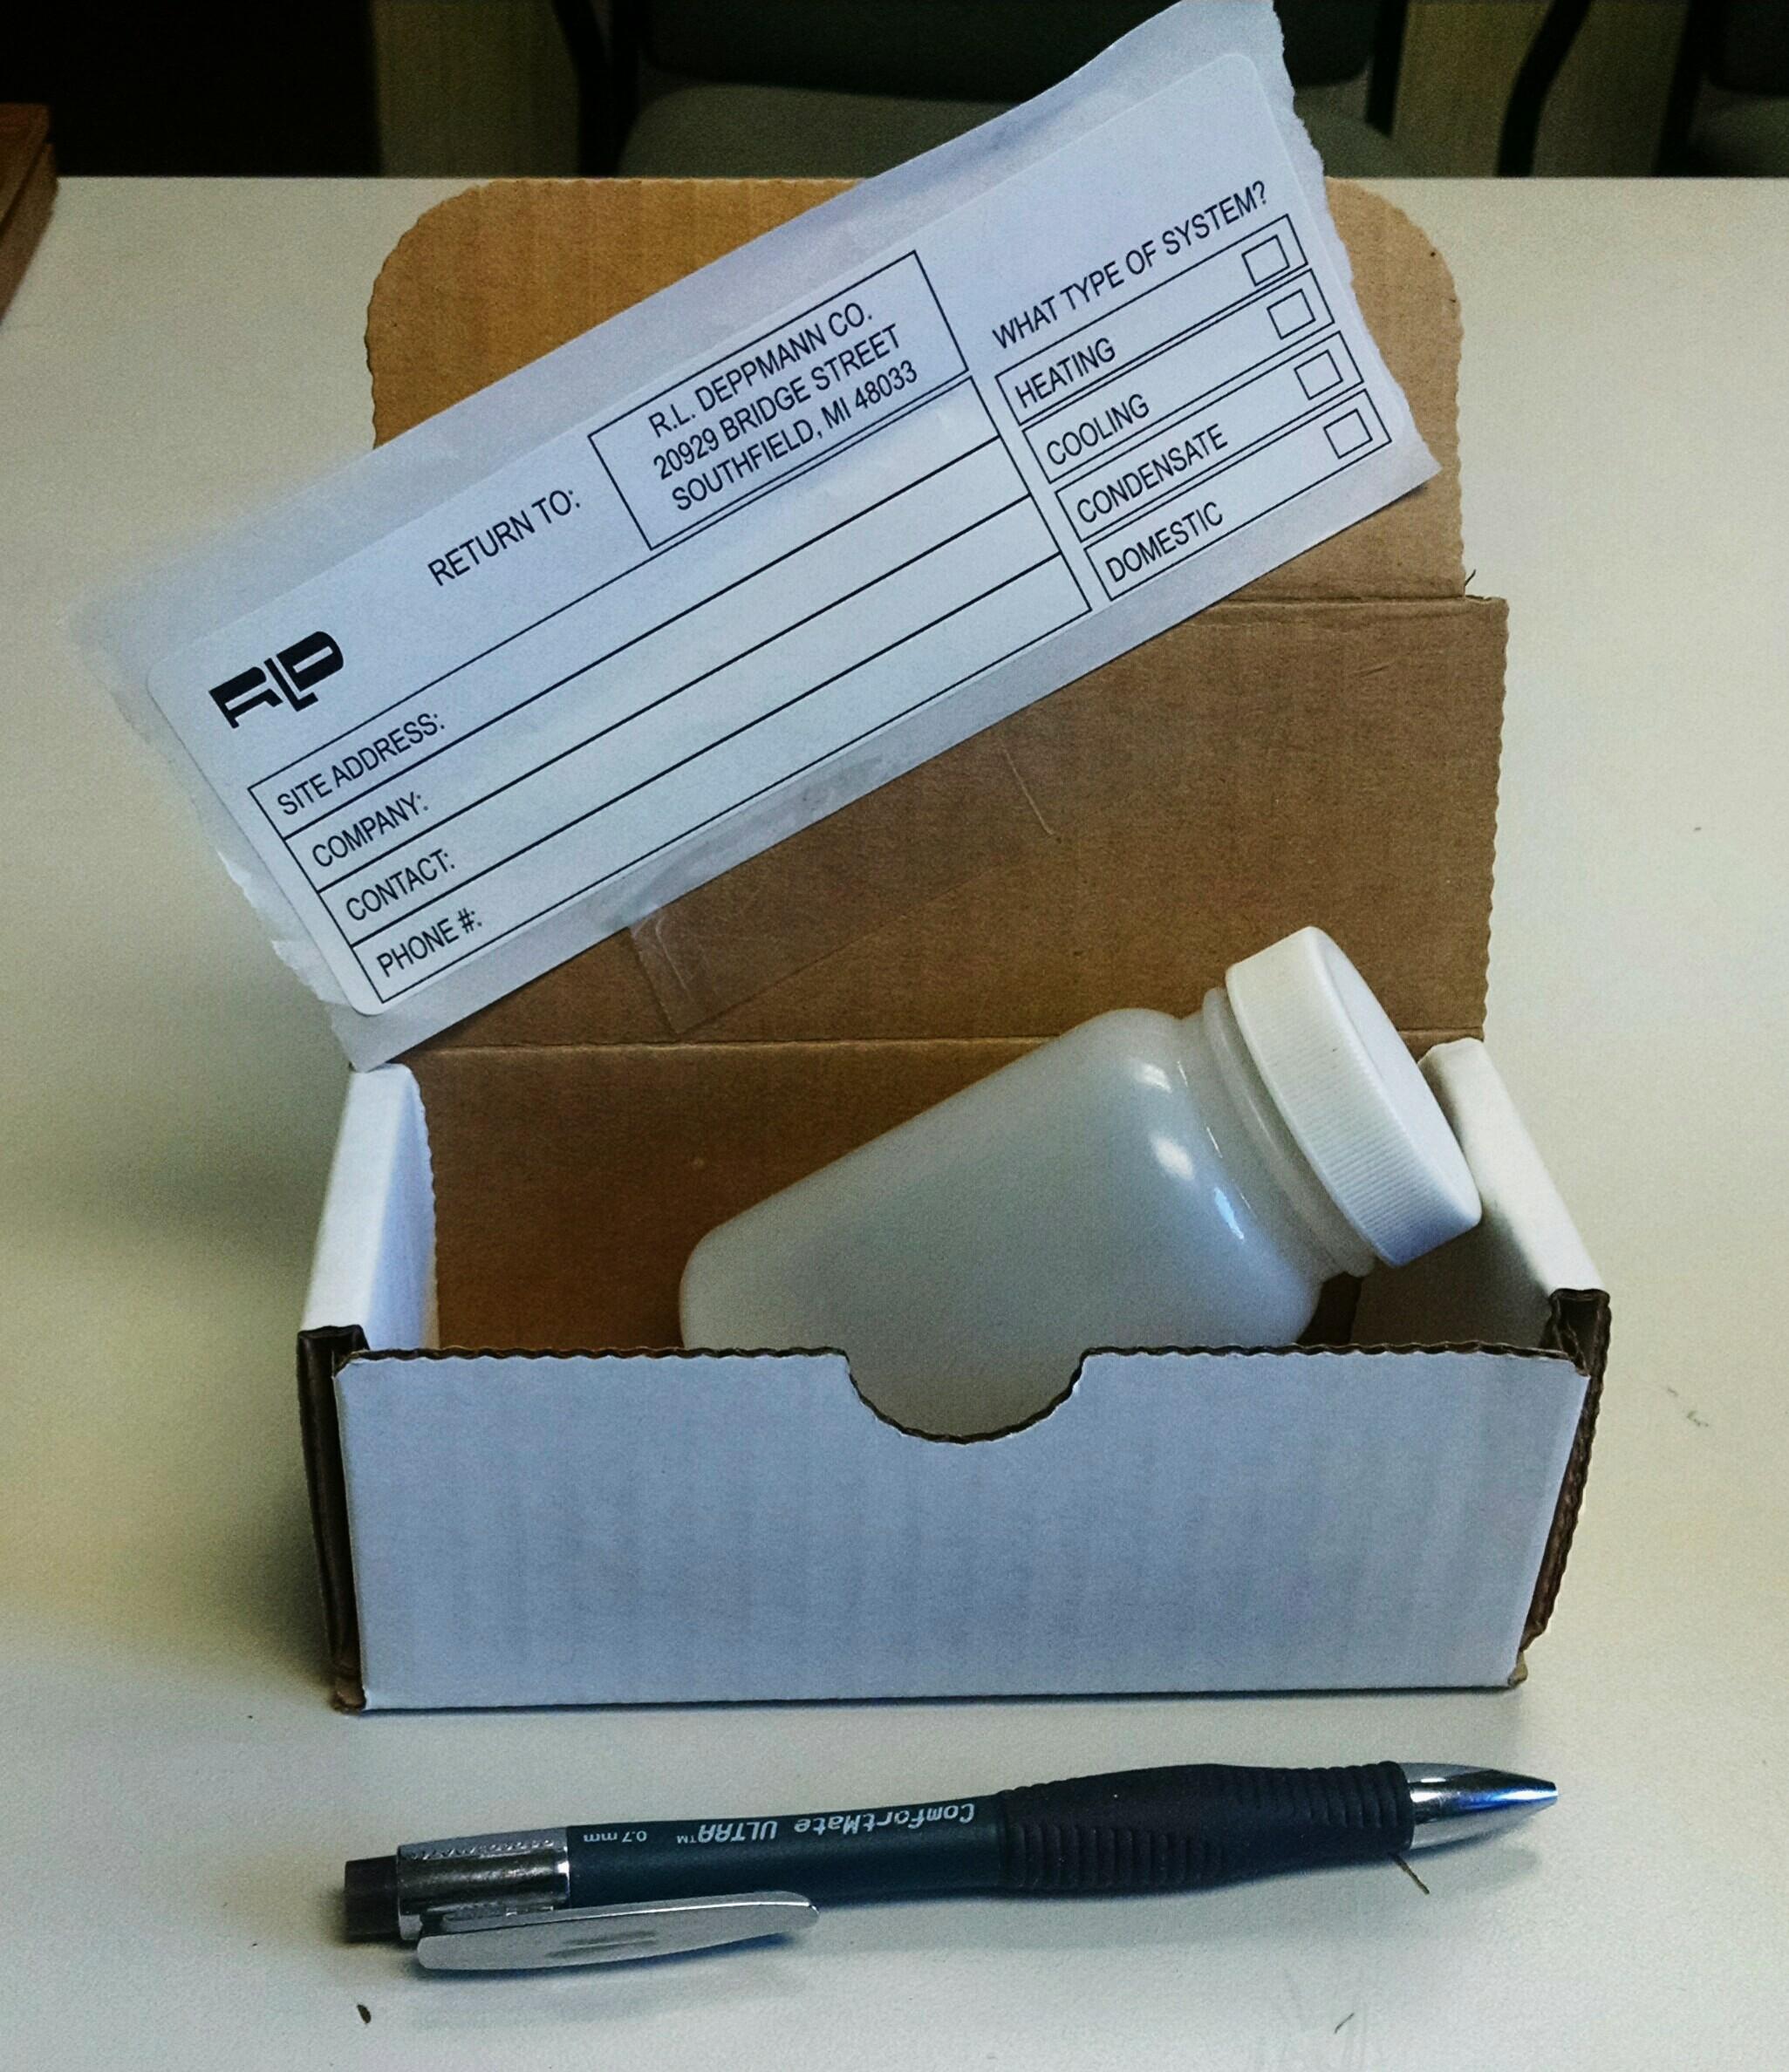 R.L. Deppmann Water Test Sample Kit